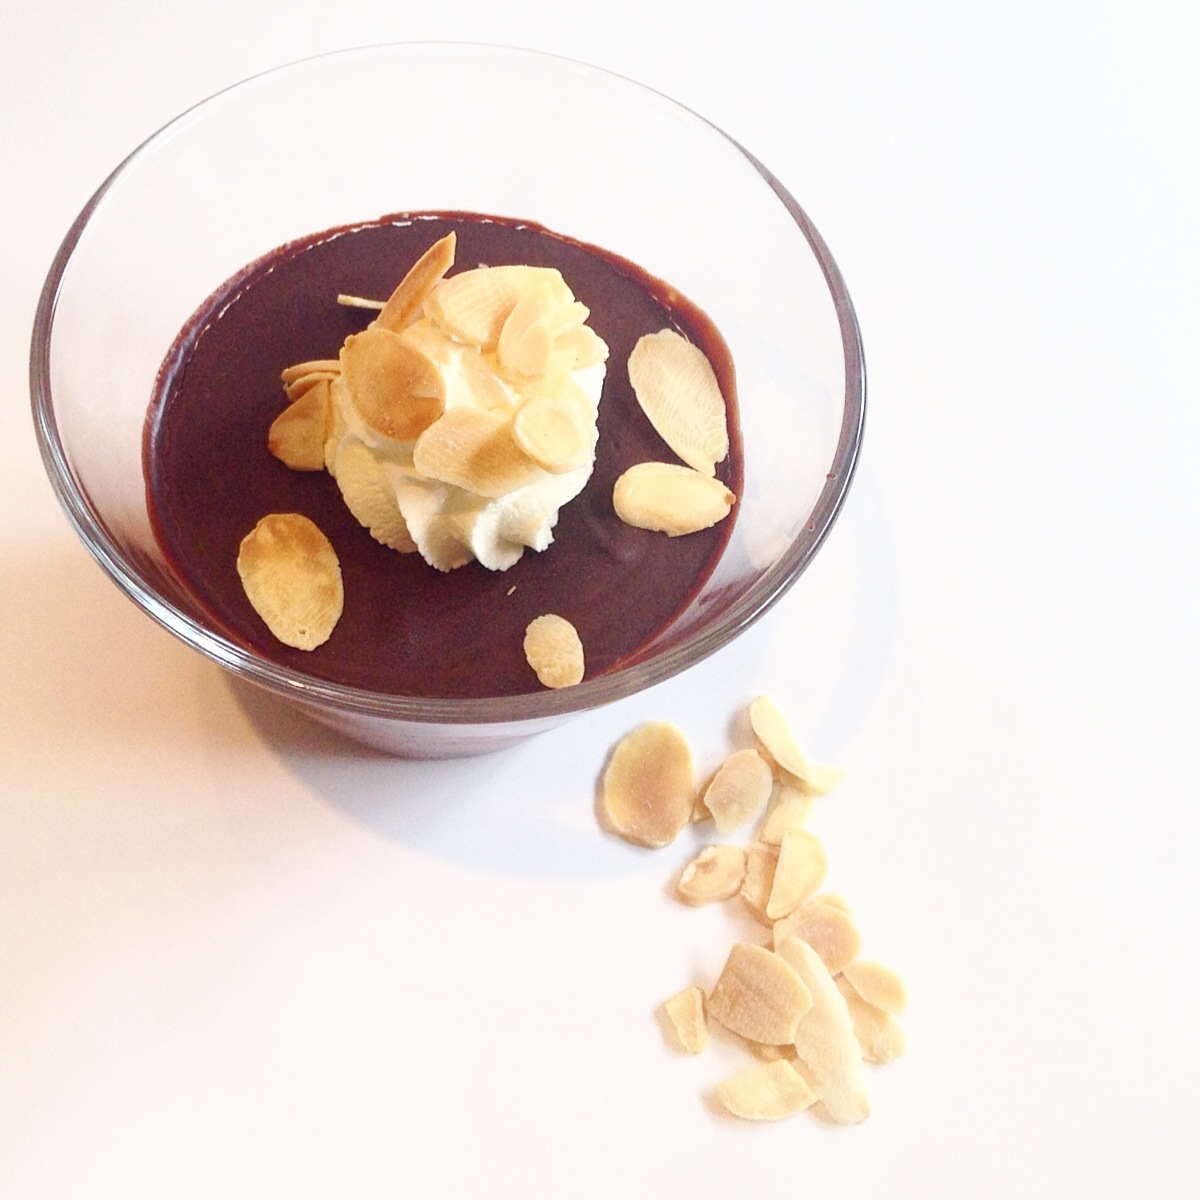 Chocolate almond pots